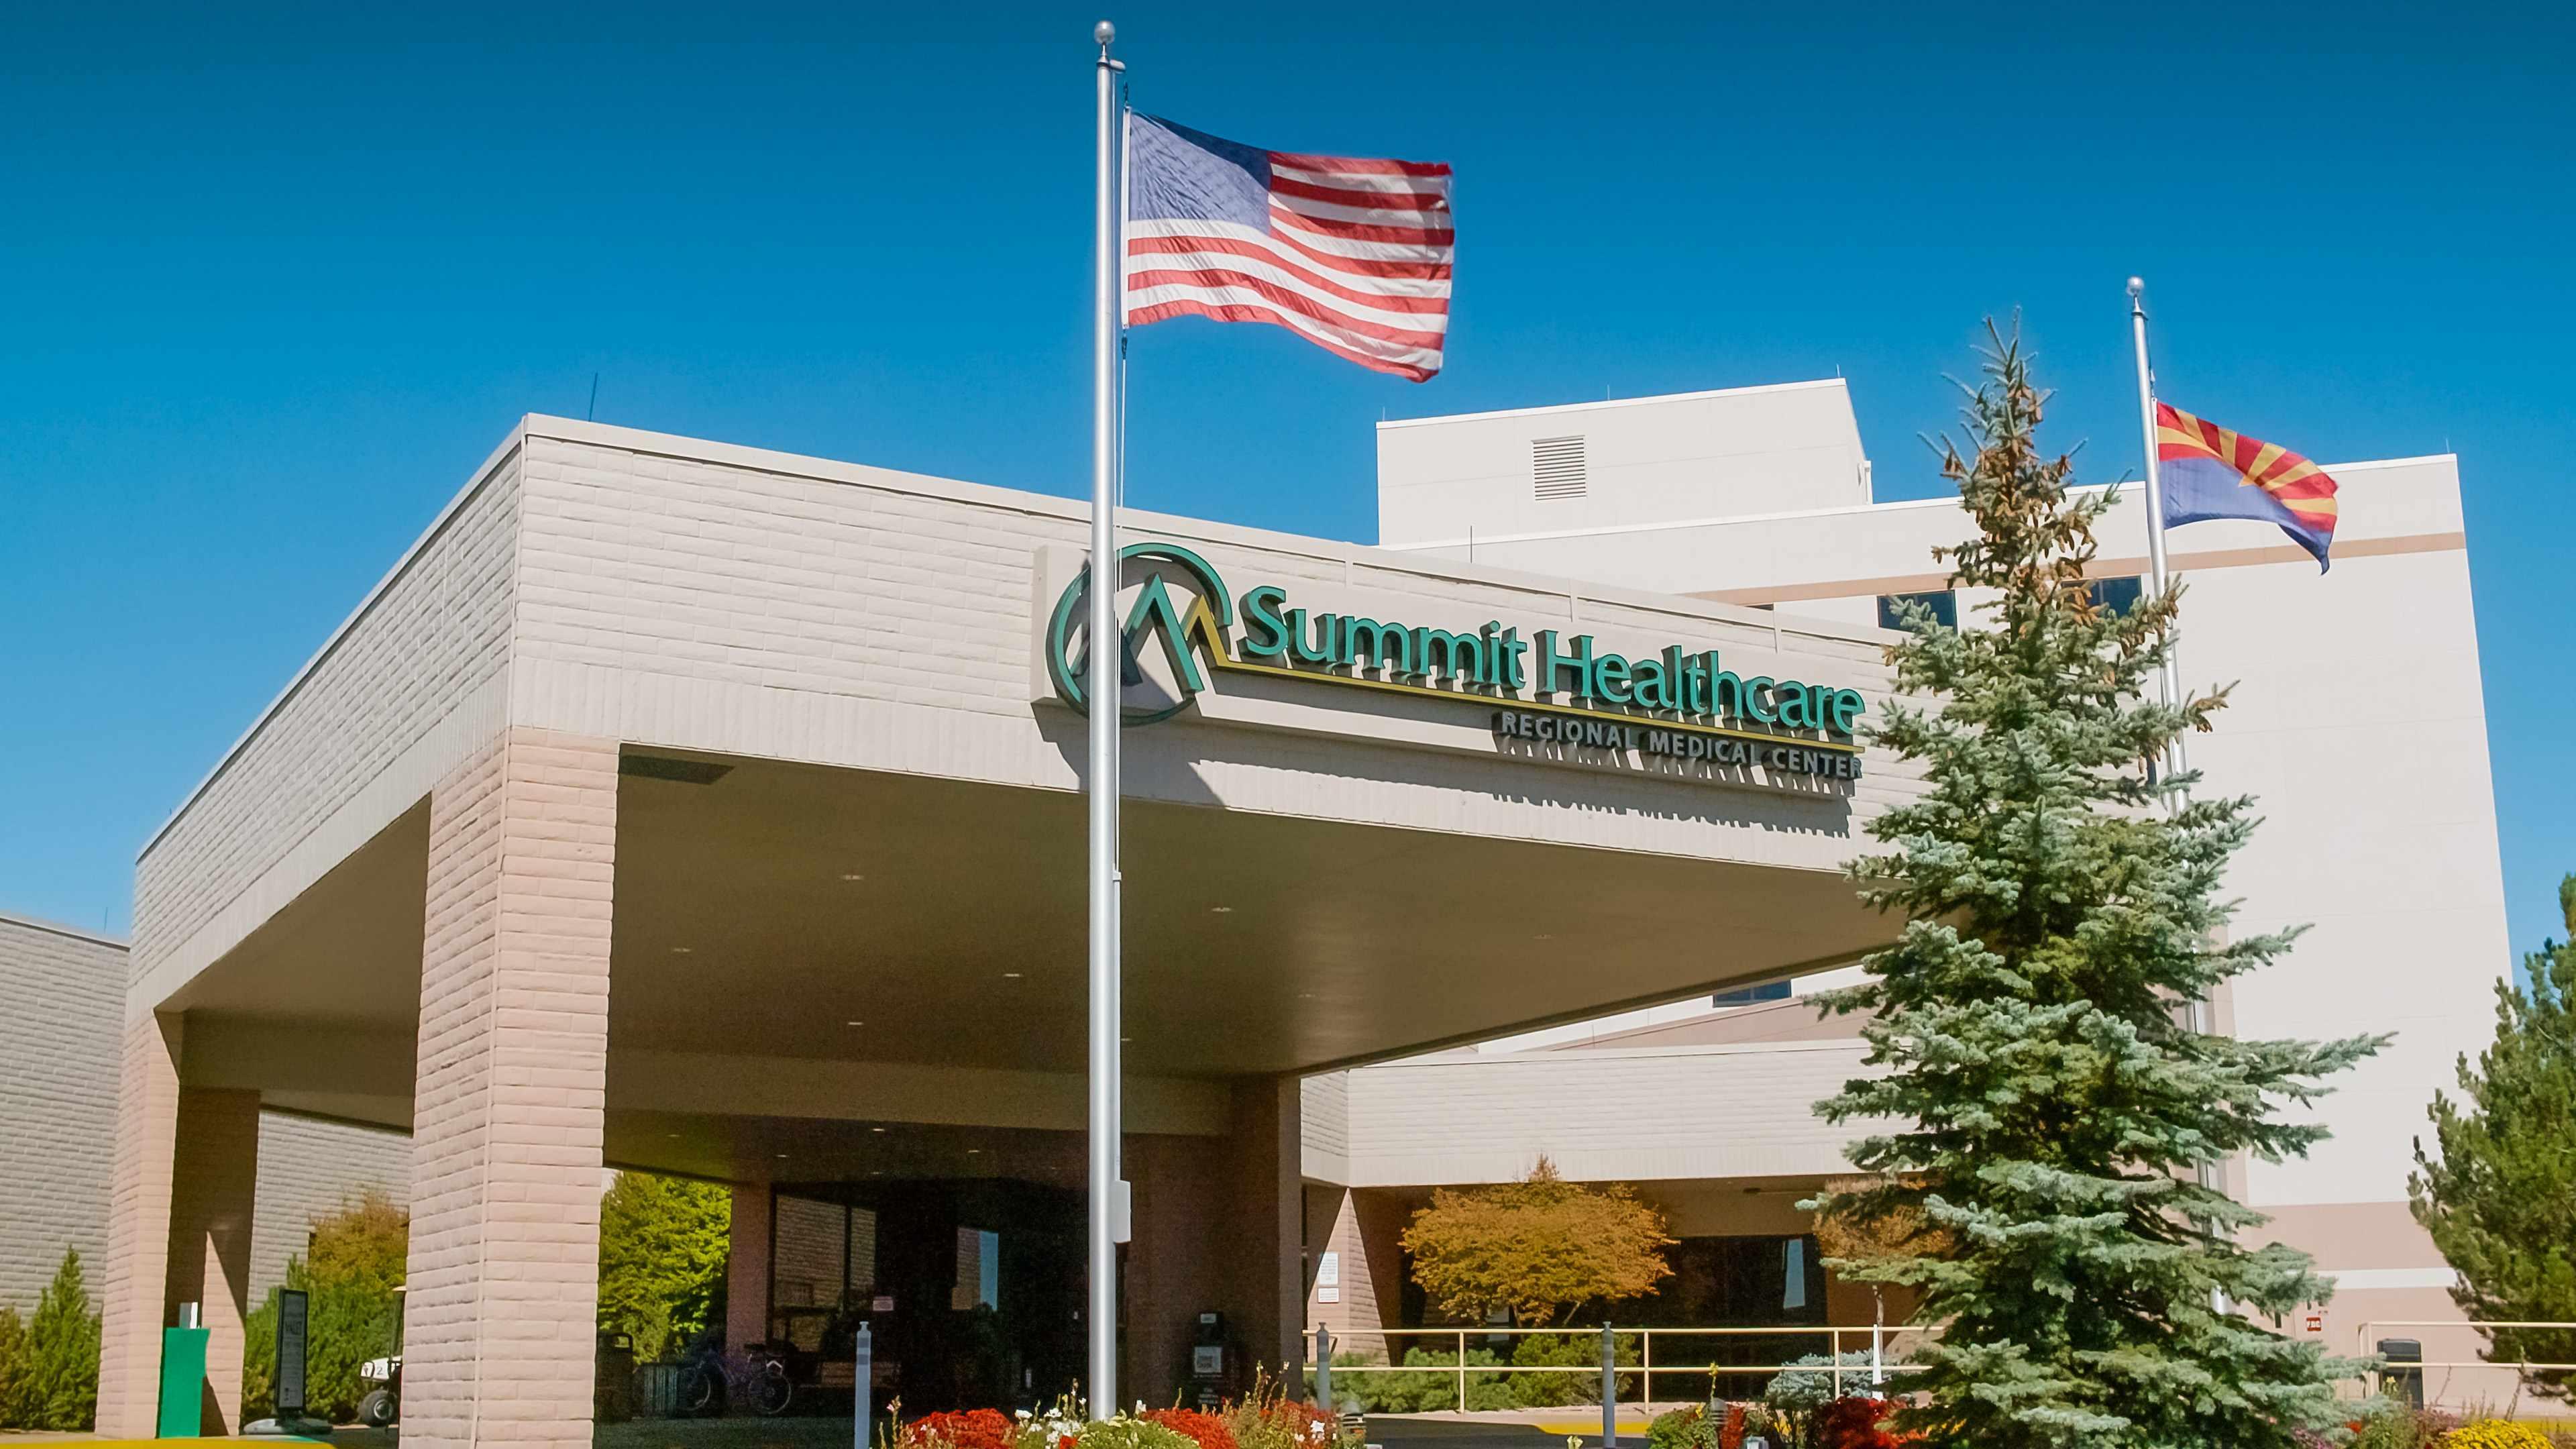 Summit Healthcare Regional Medical Center entrace